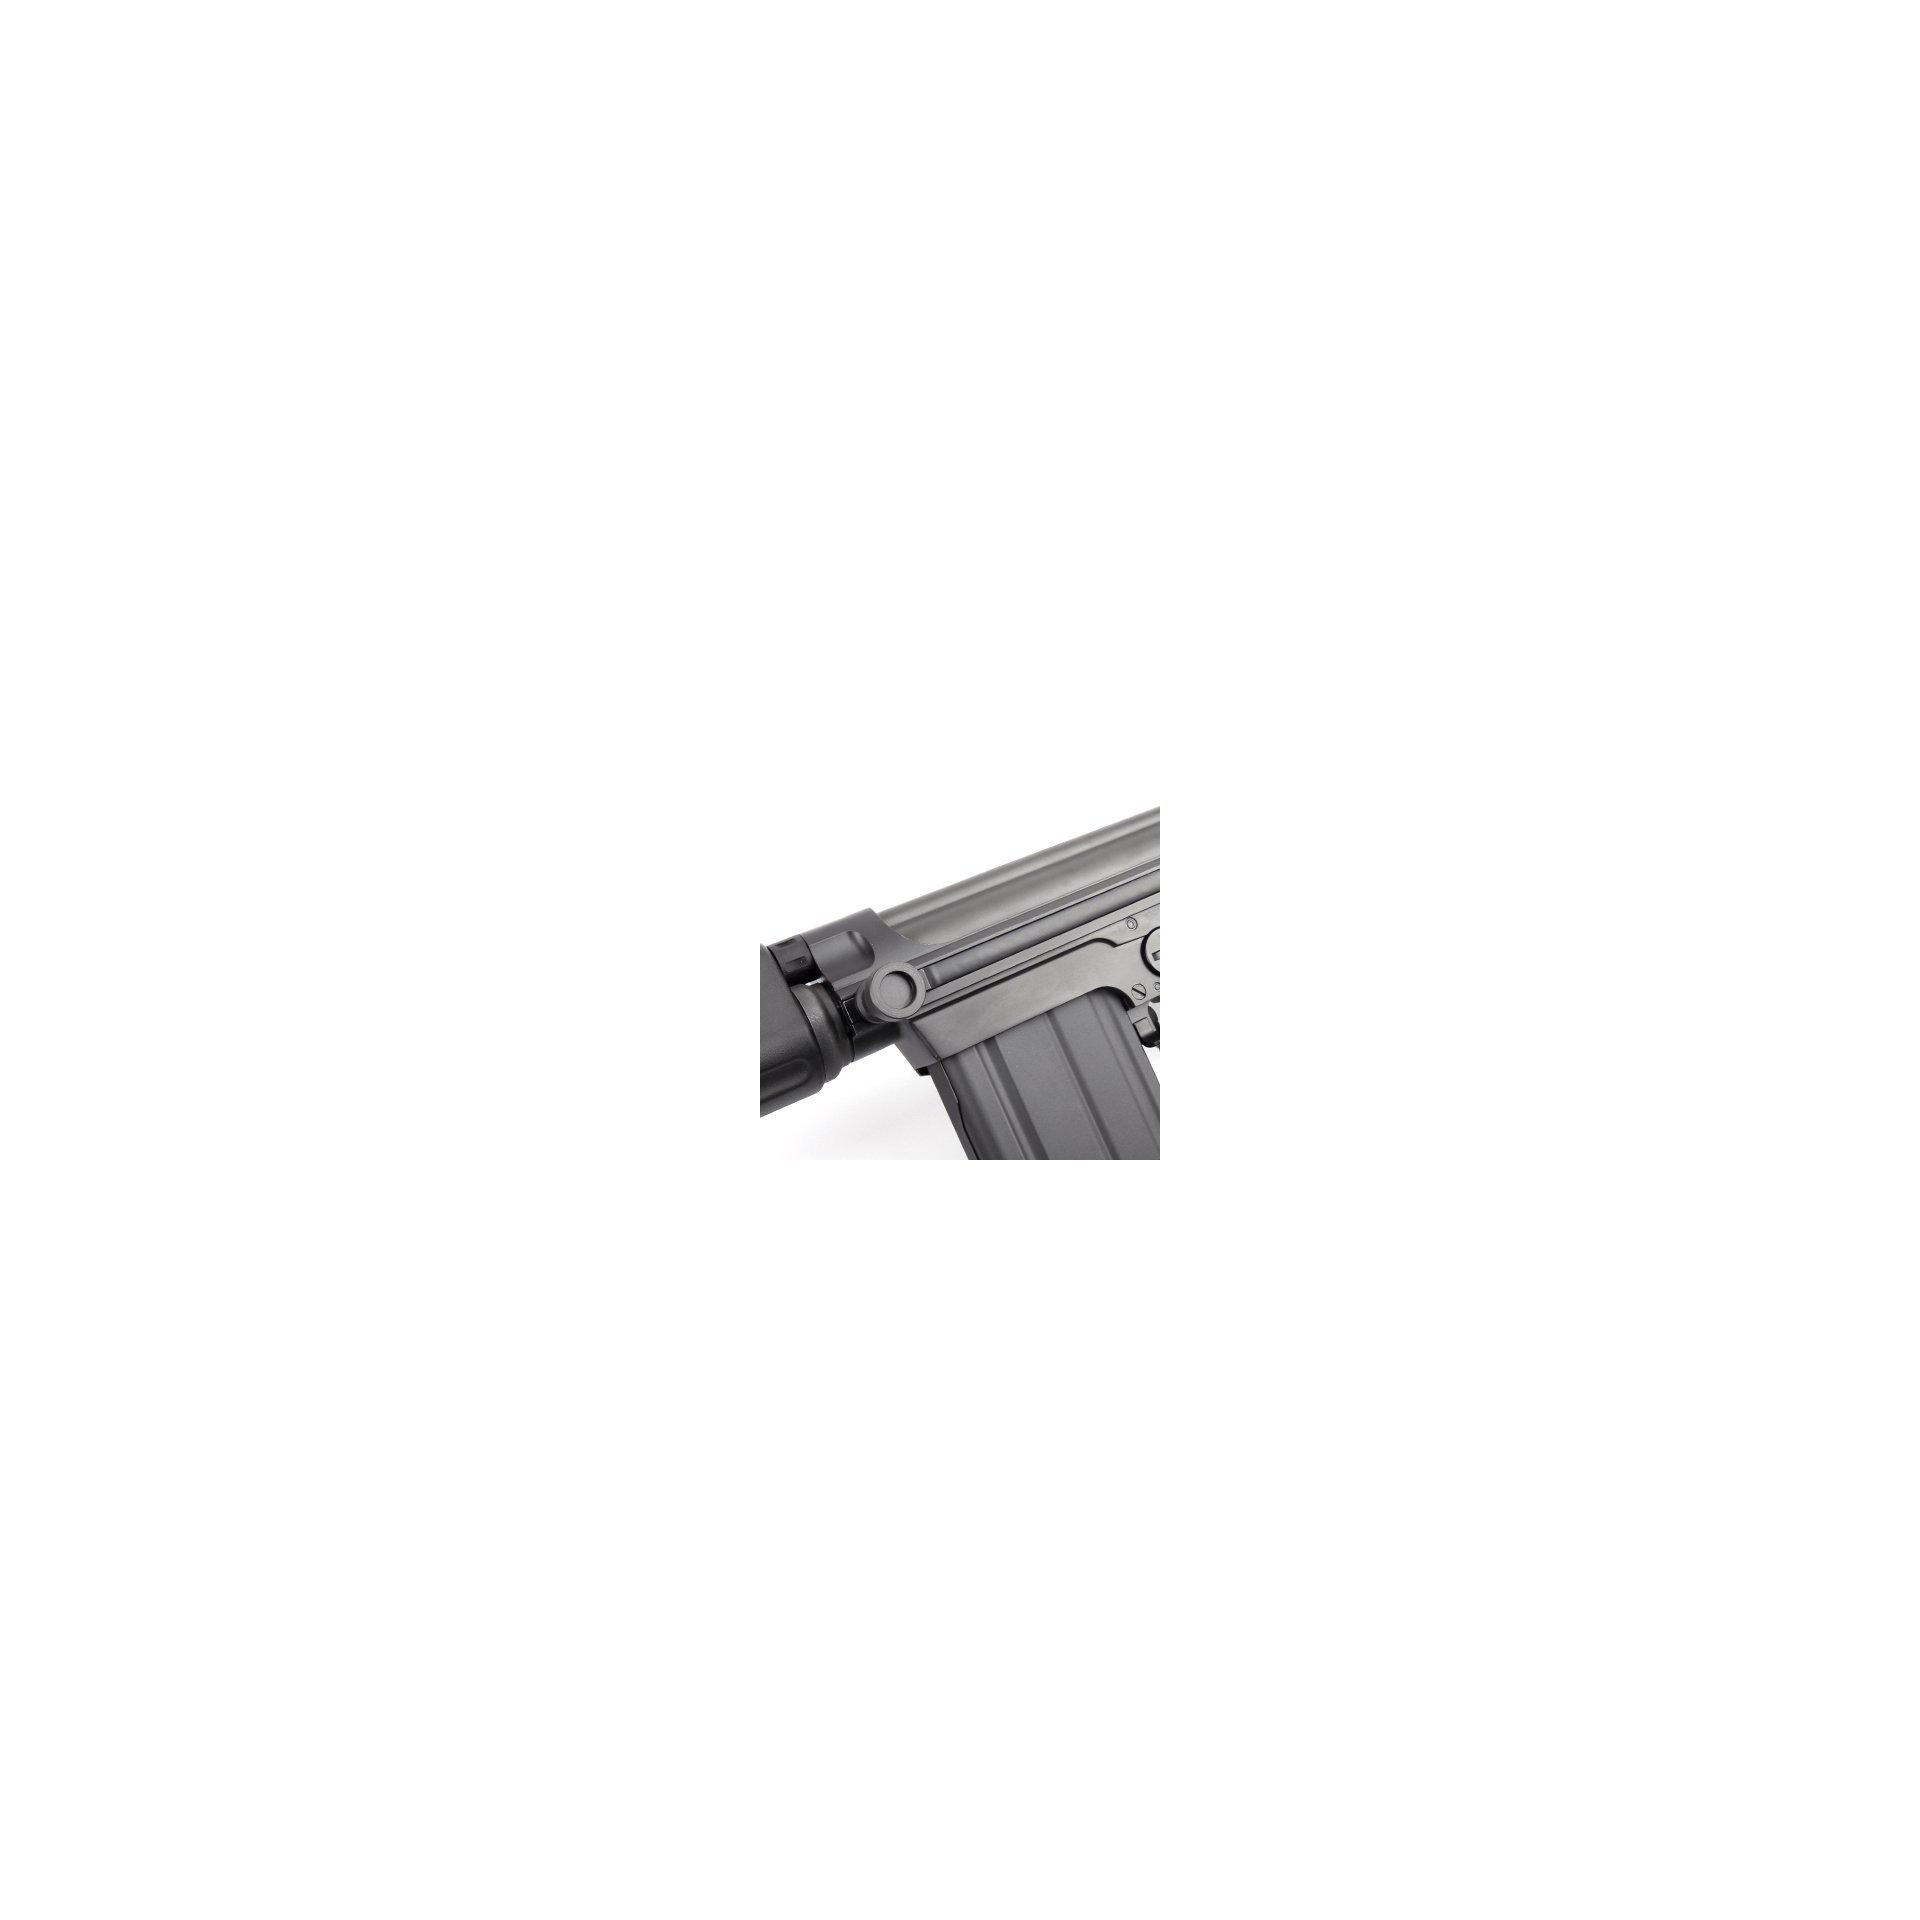 Rifle De Airsoft Fal  Tactical Carbine Full Metal Cal 6.0mm - King Arms